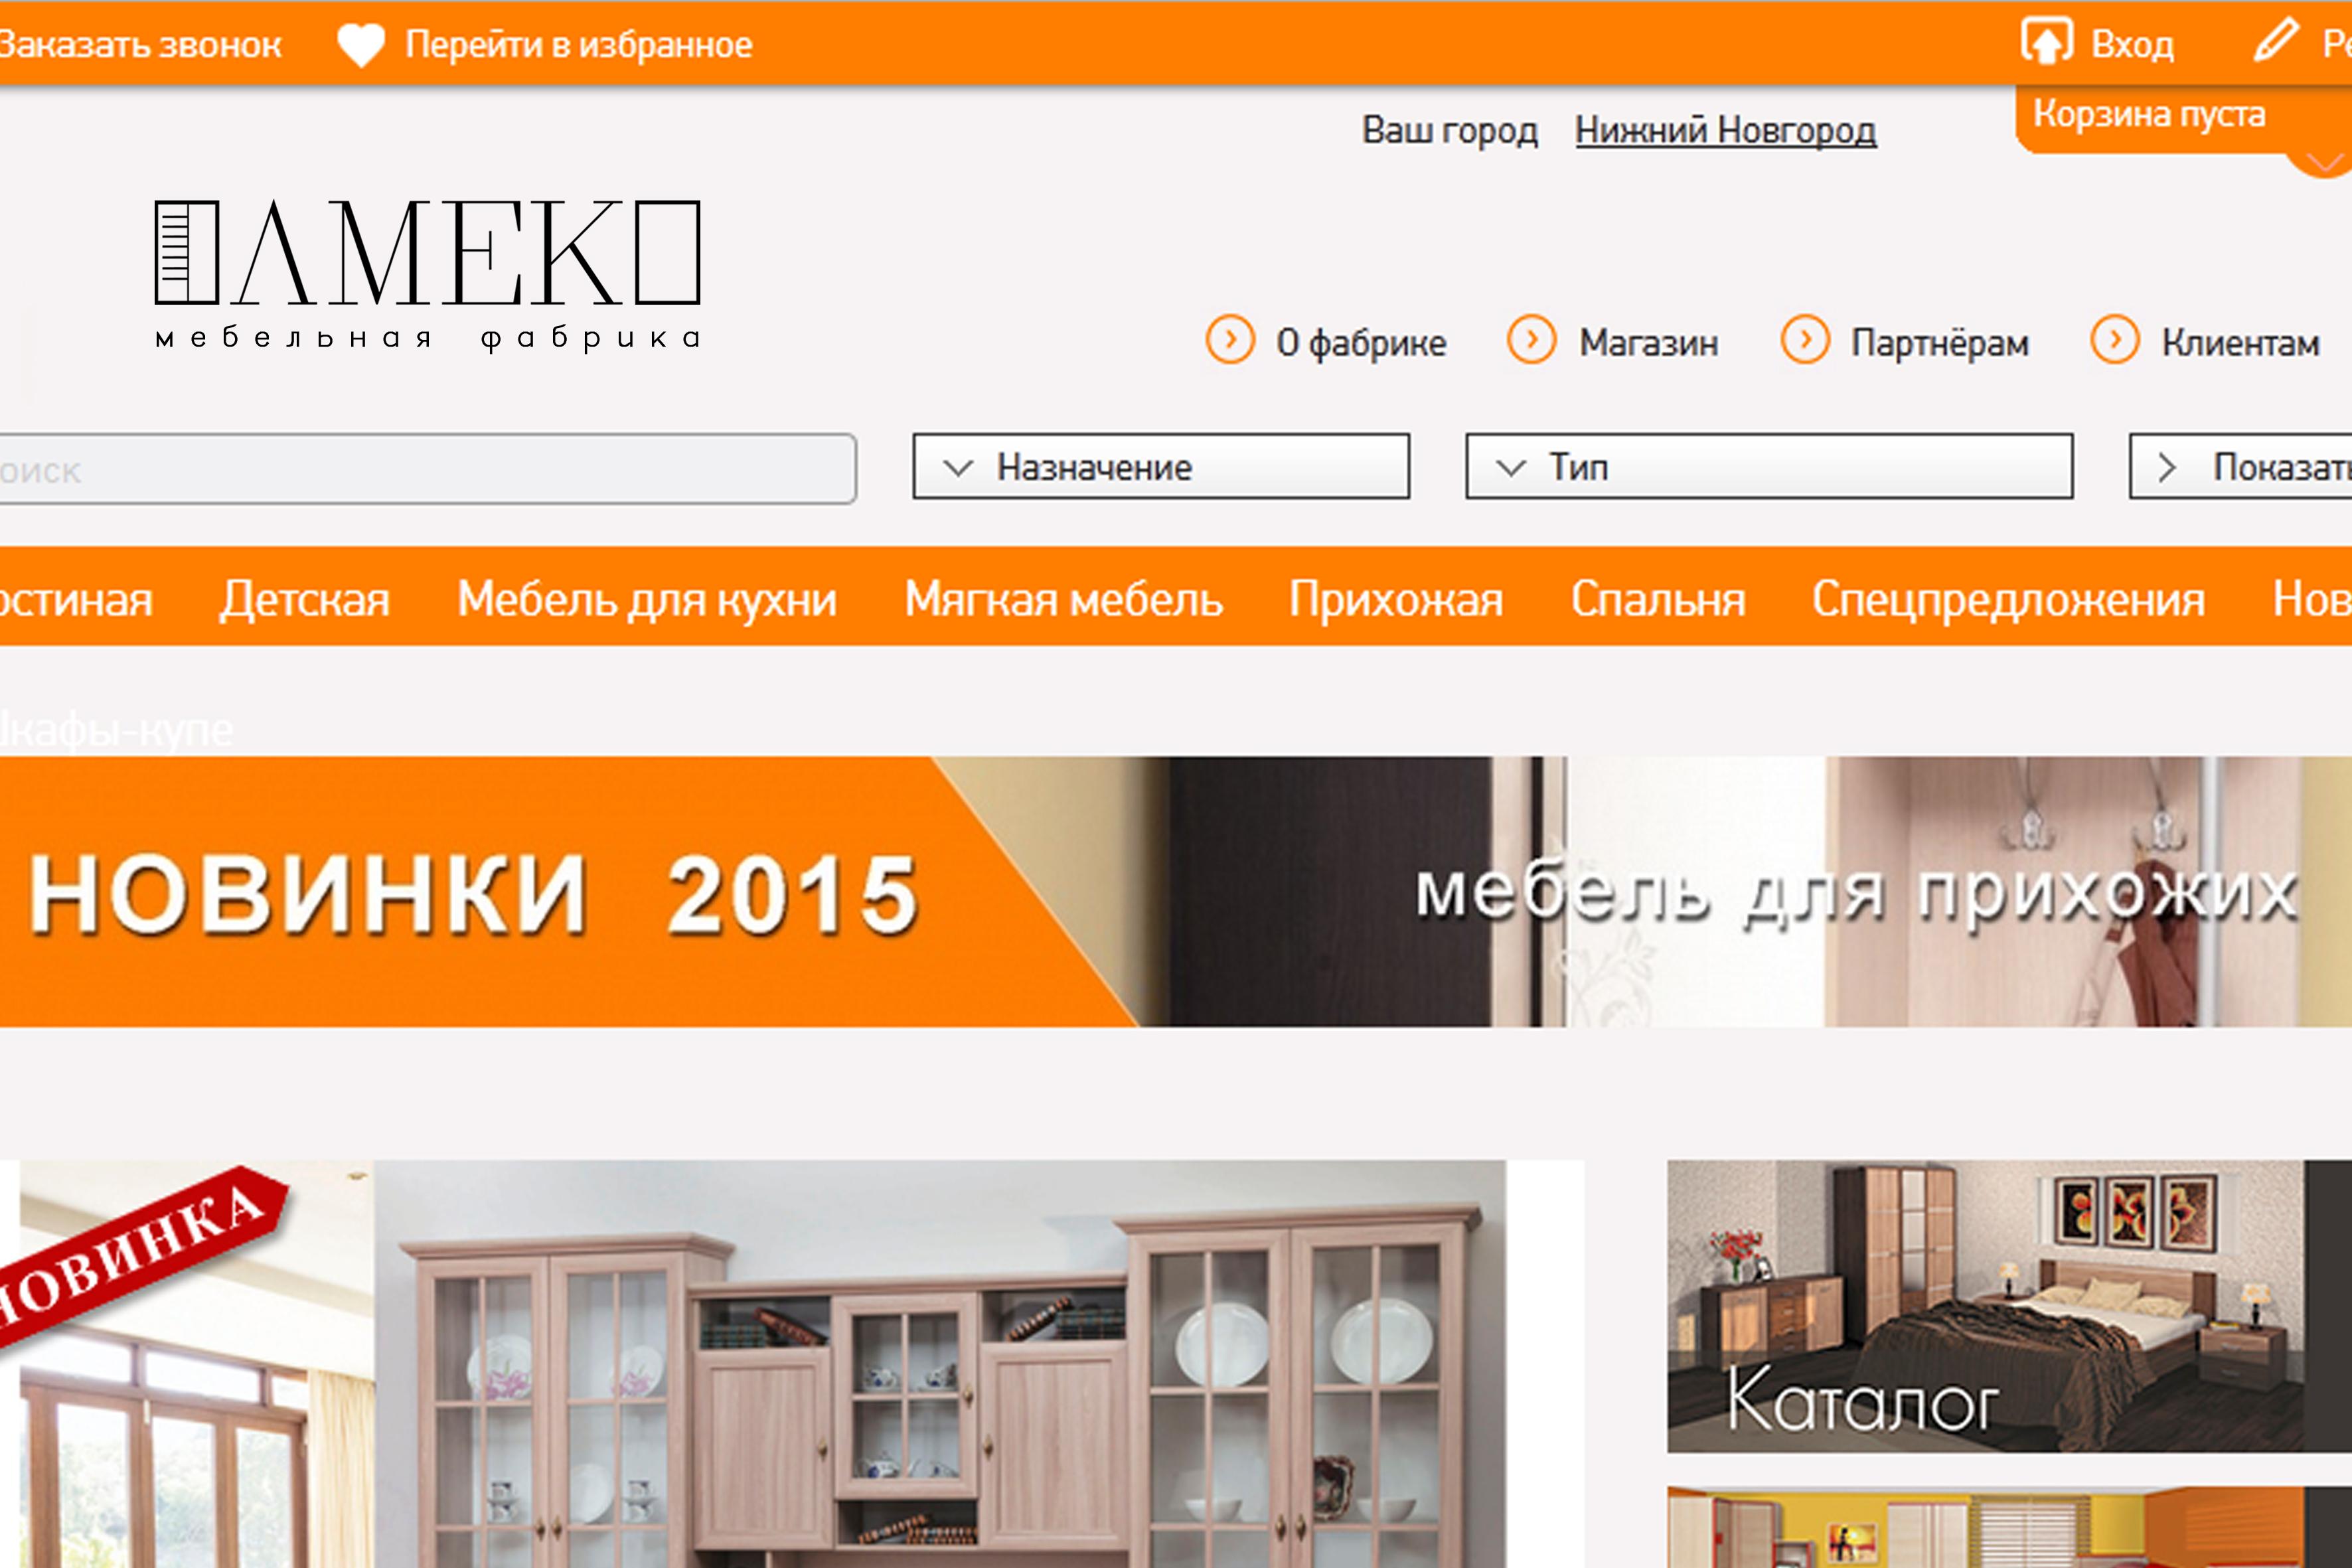 Ребрендинг/Редизайн логотипа Мебельной Фабрики фото f_455548f073acd9c4.jpg